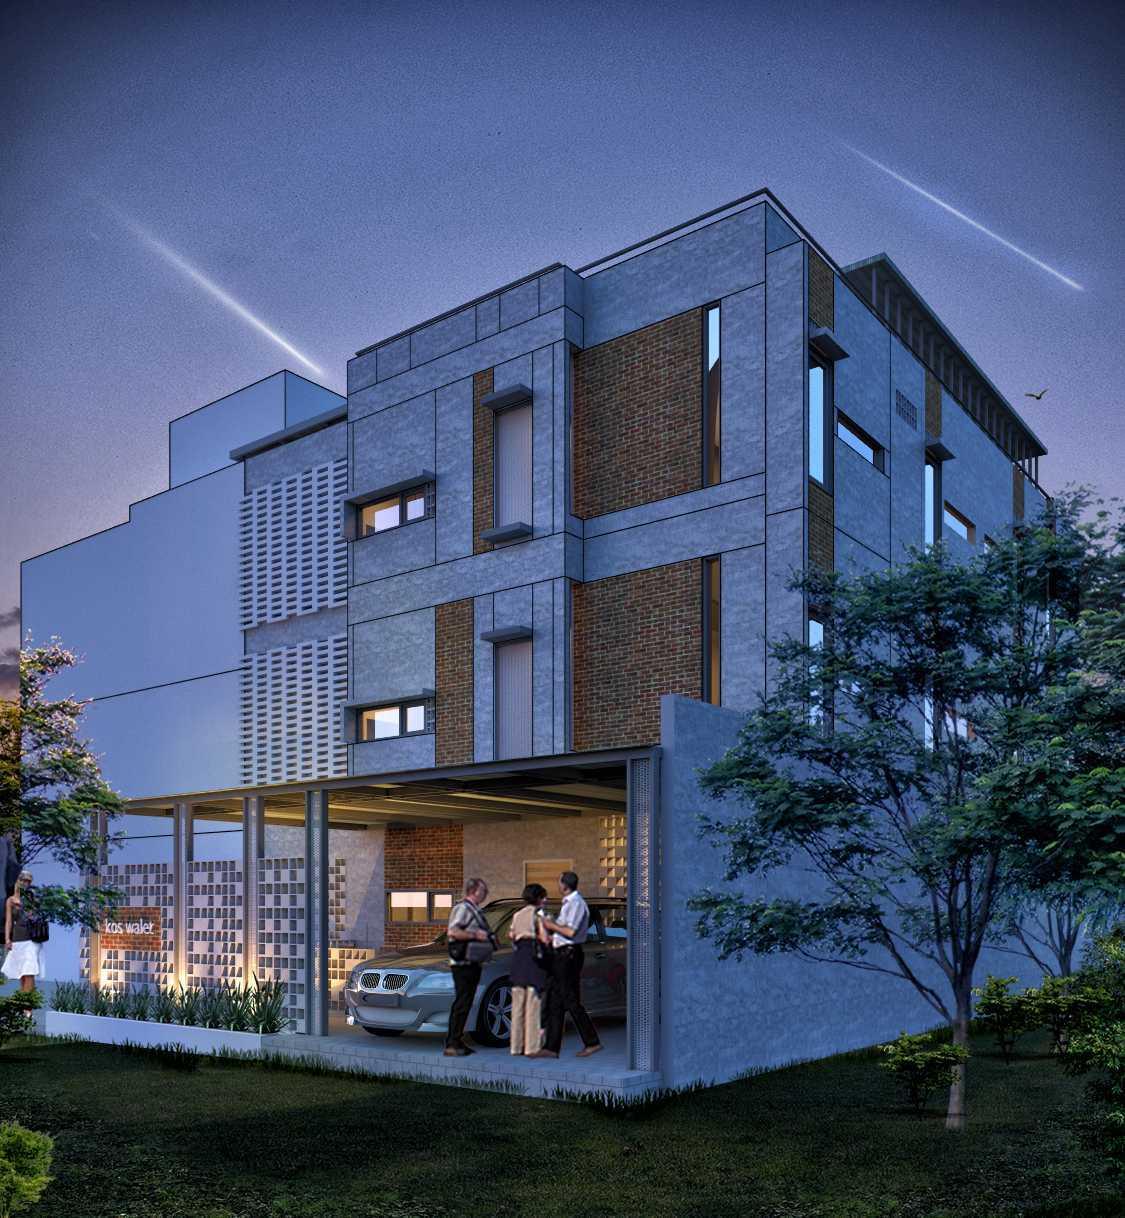 Zigzag Architecture Studio Kos-Kosan Ui Depok, Kota Depok, Jawa Barat, Indonesia Depok, Kota Depok, Jawa Barat, Indonesia Koskosanview2 Modern 37069